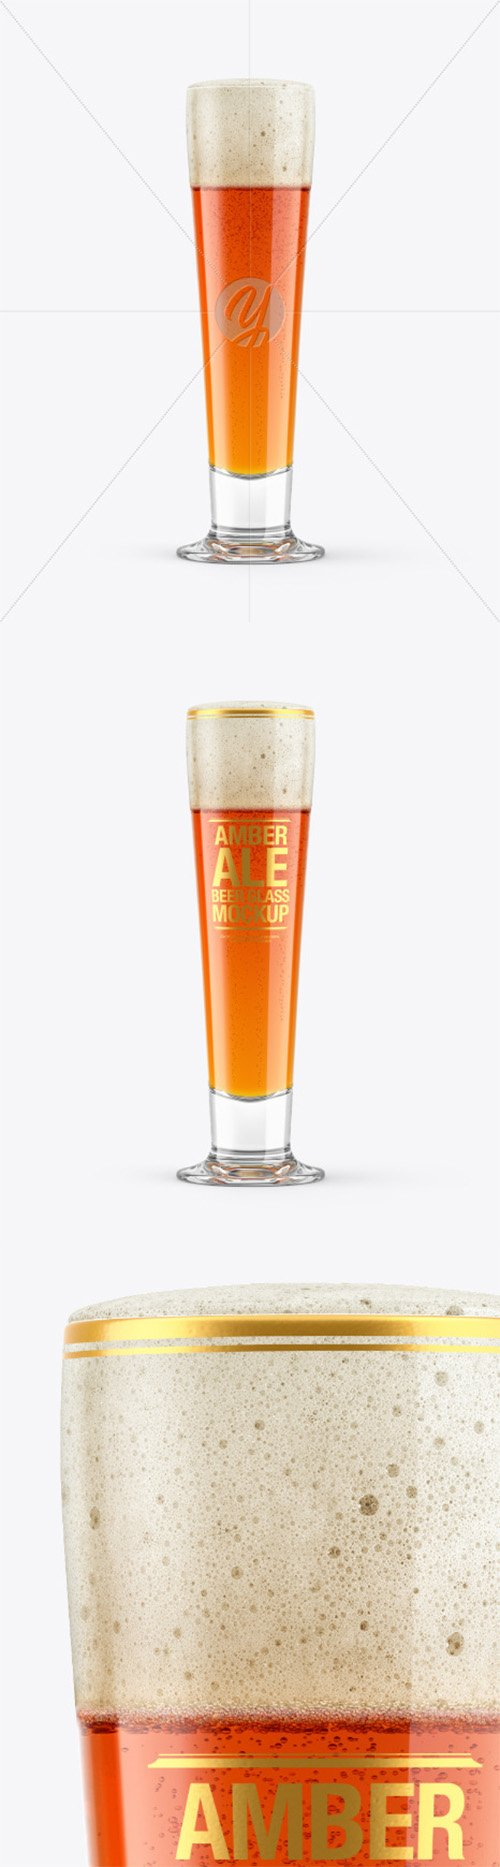 Amber Ale Beer Glass Mockup 65174